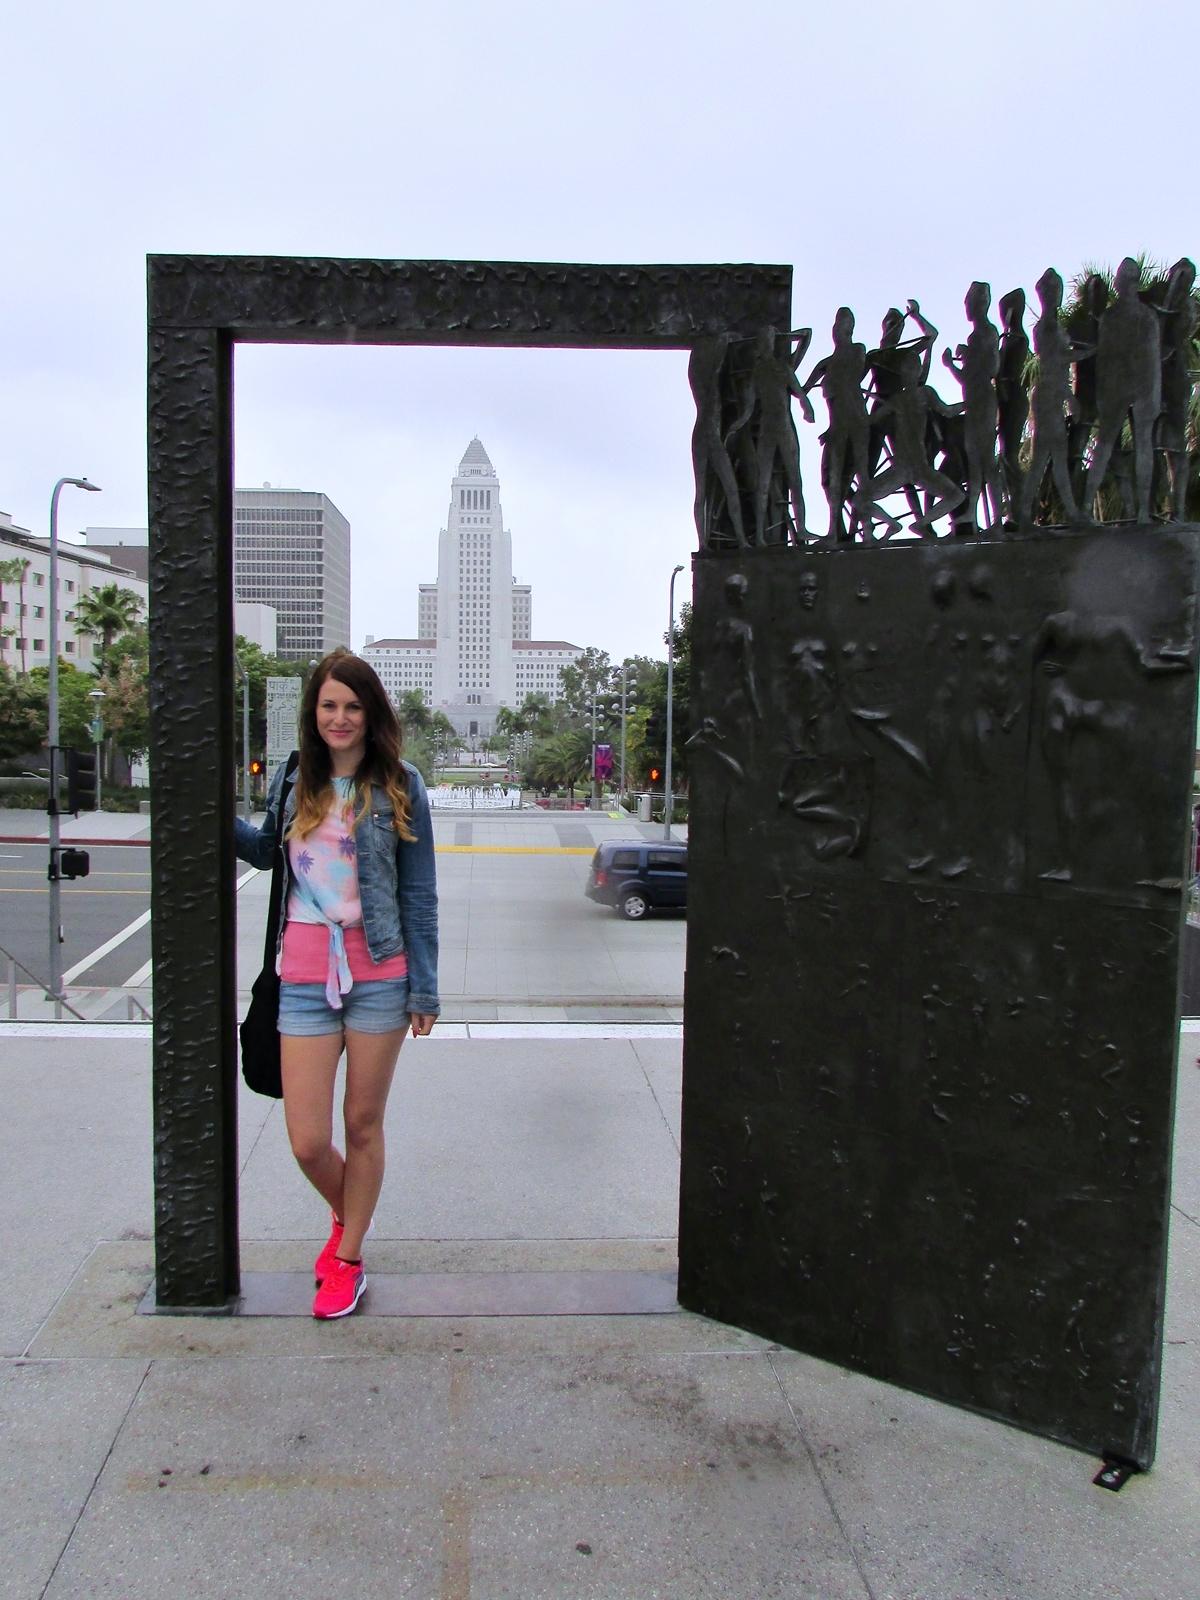 Los Angeles - Rathaus - LA City Hall - Rundreise - Roadtrip - Amerika - USA - Fashionladyloves by Tamara Wagner - Travelblog